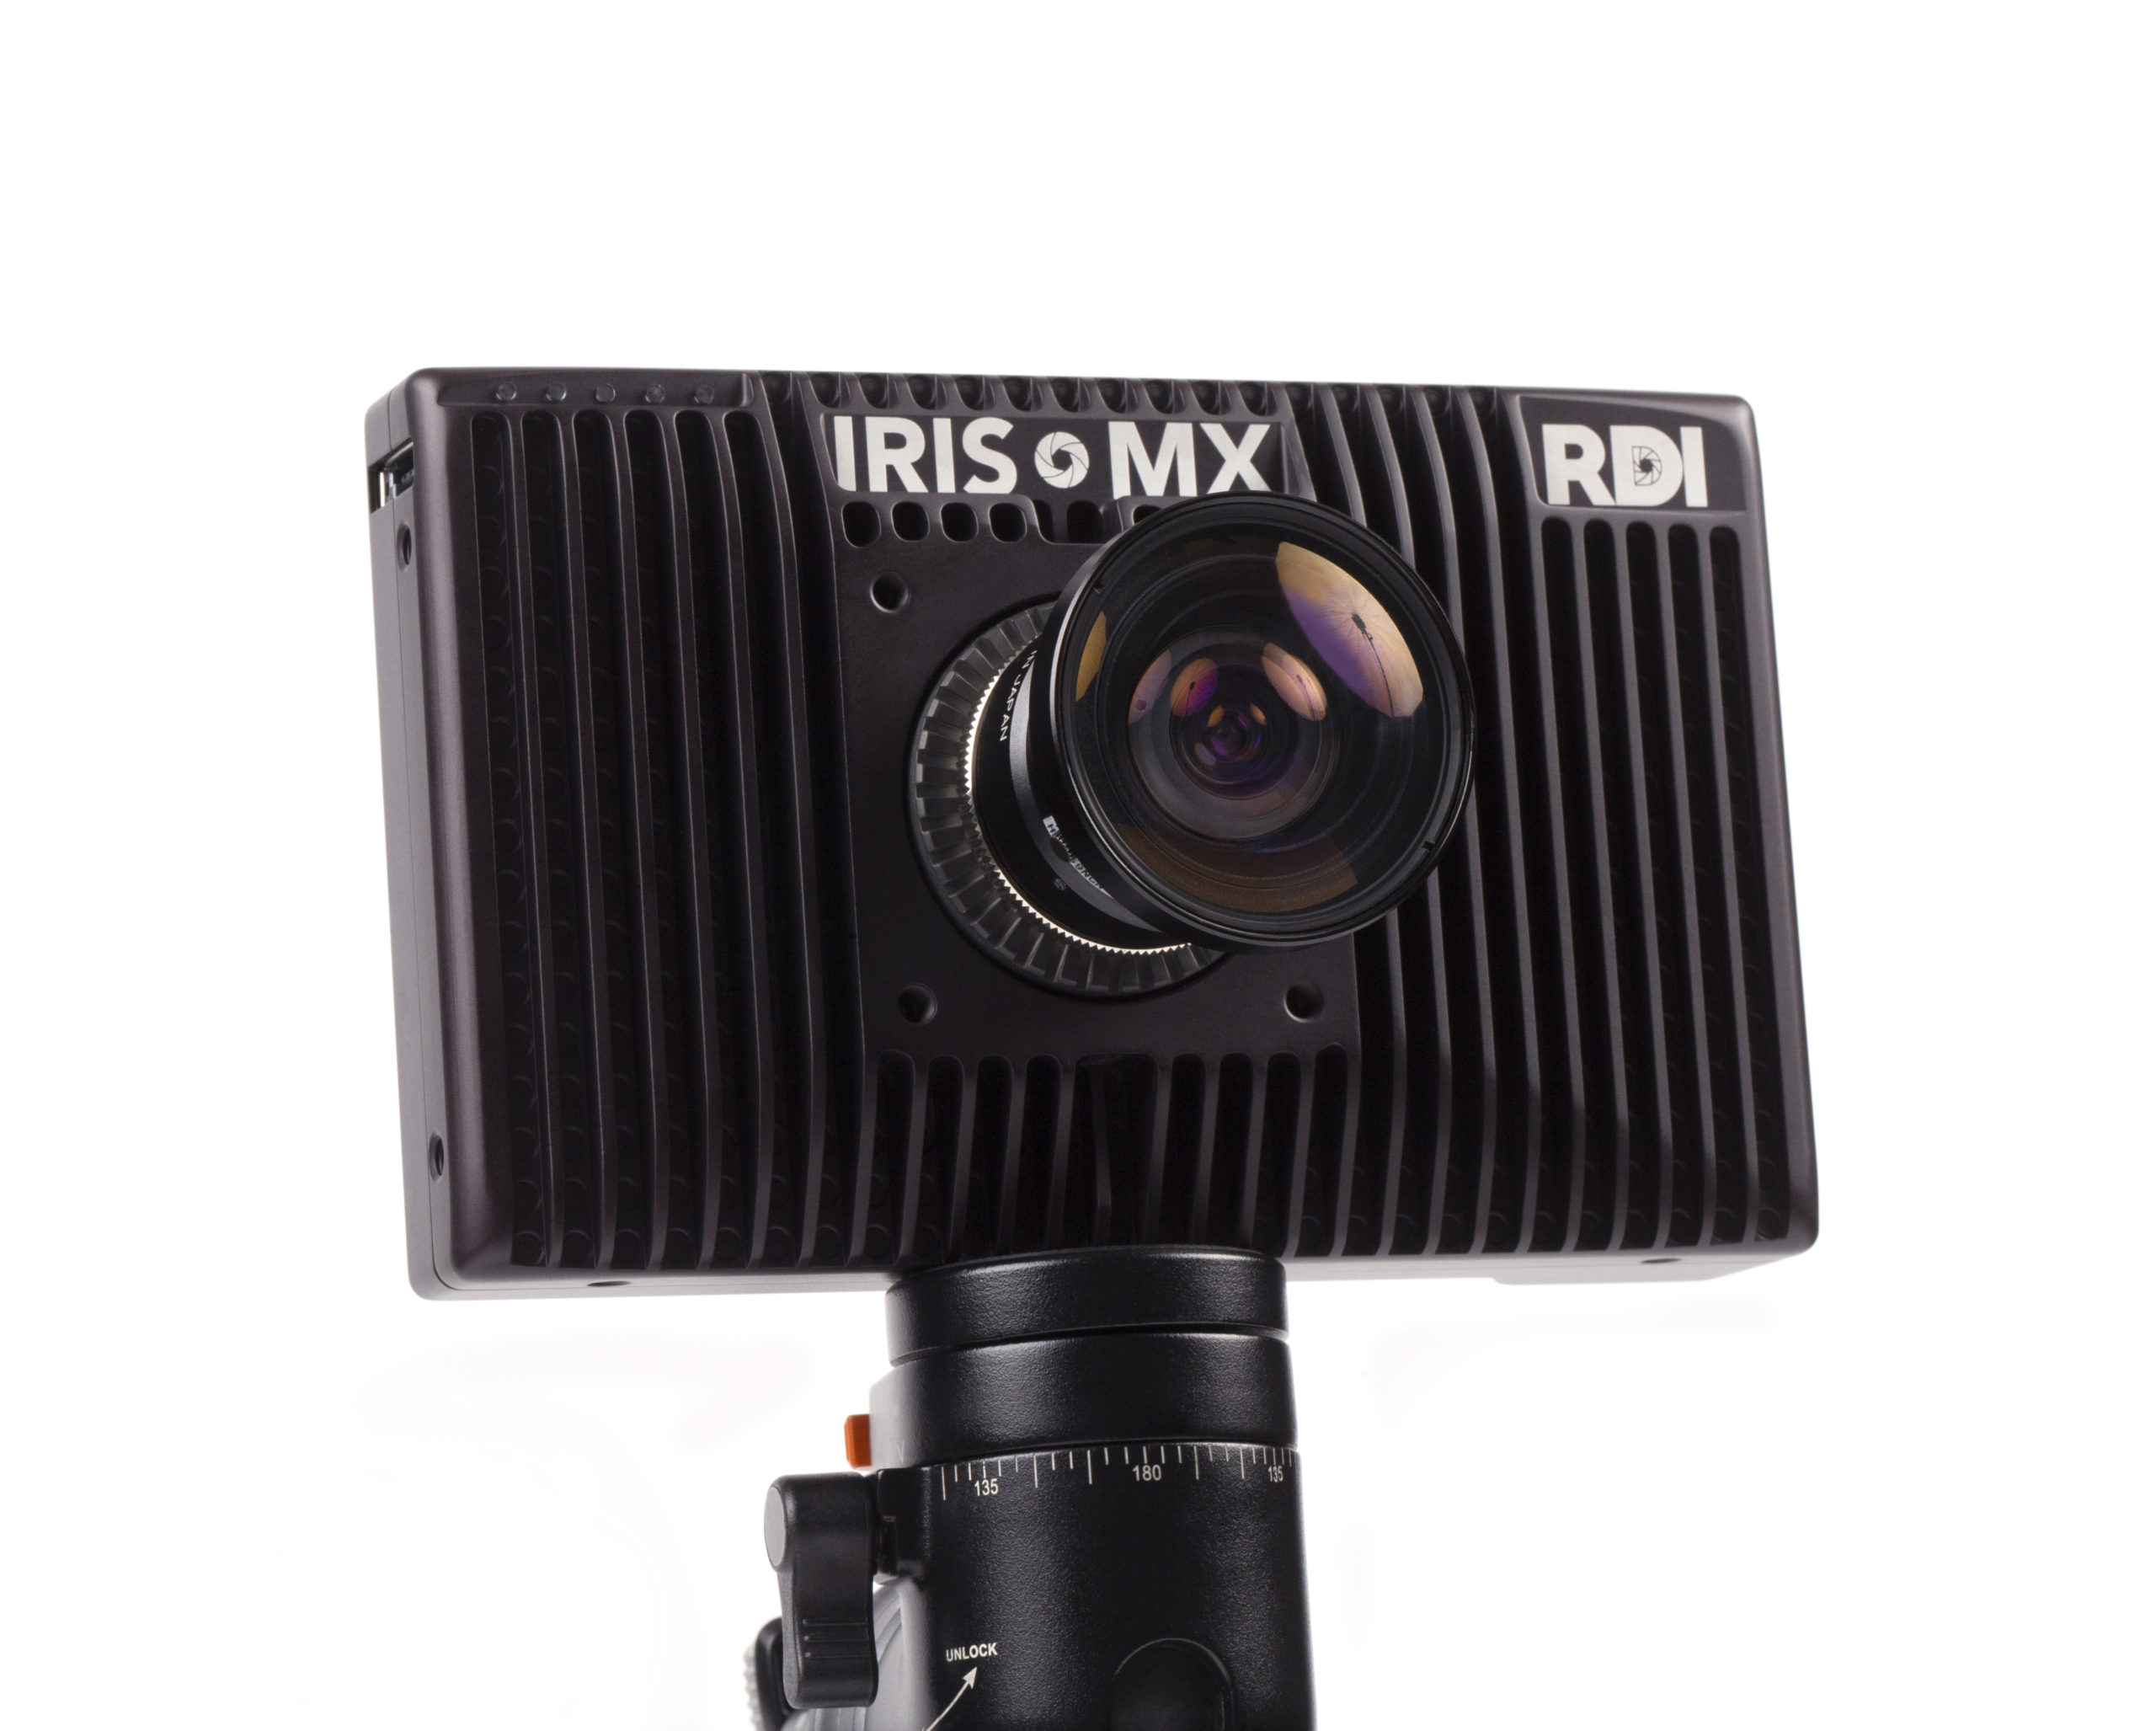 Iris MX Close